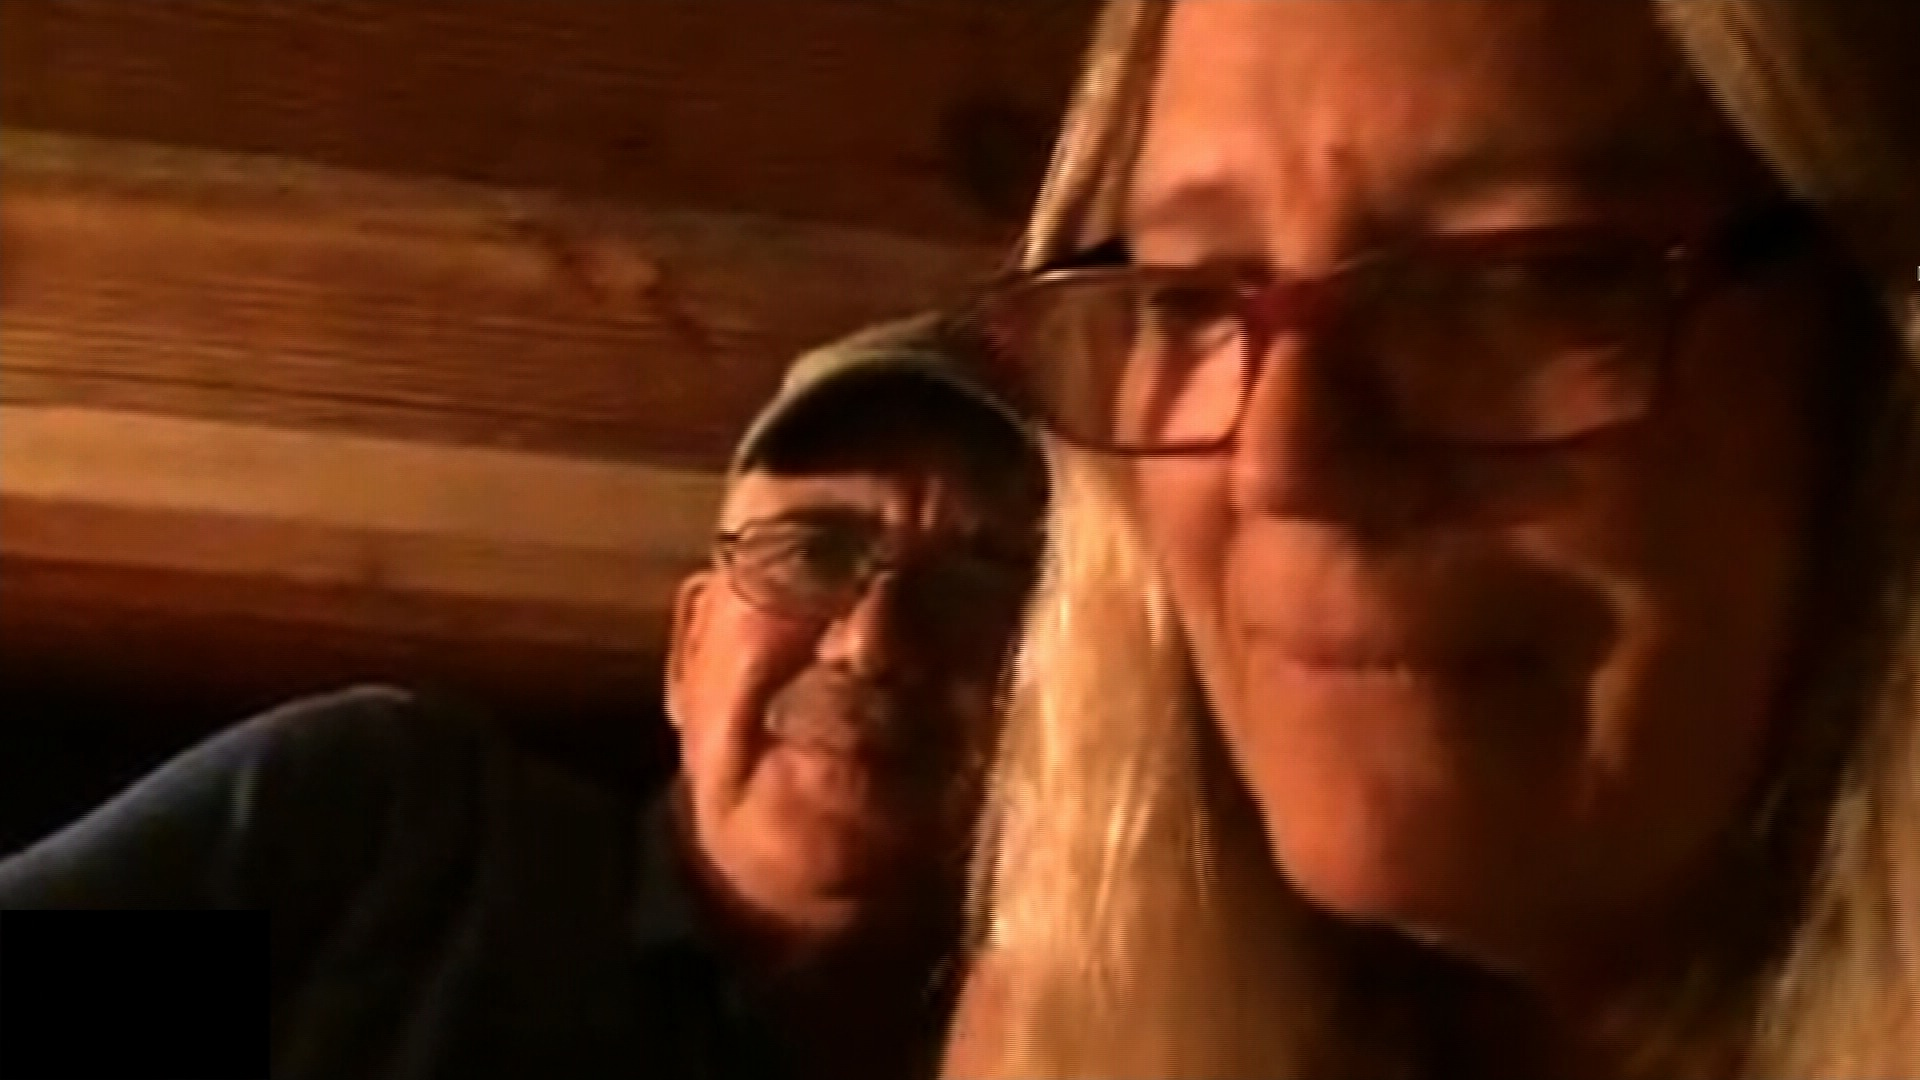 Brandi husband threesome share